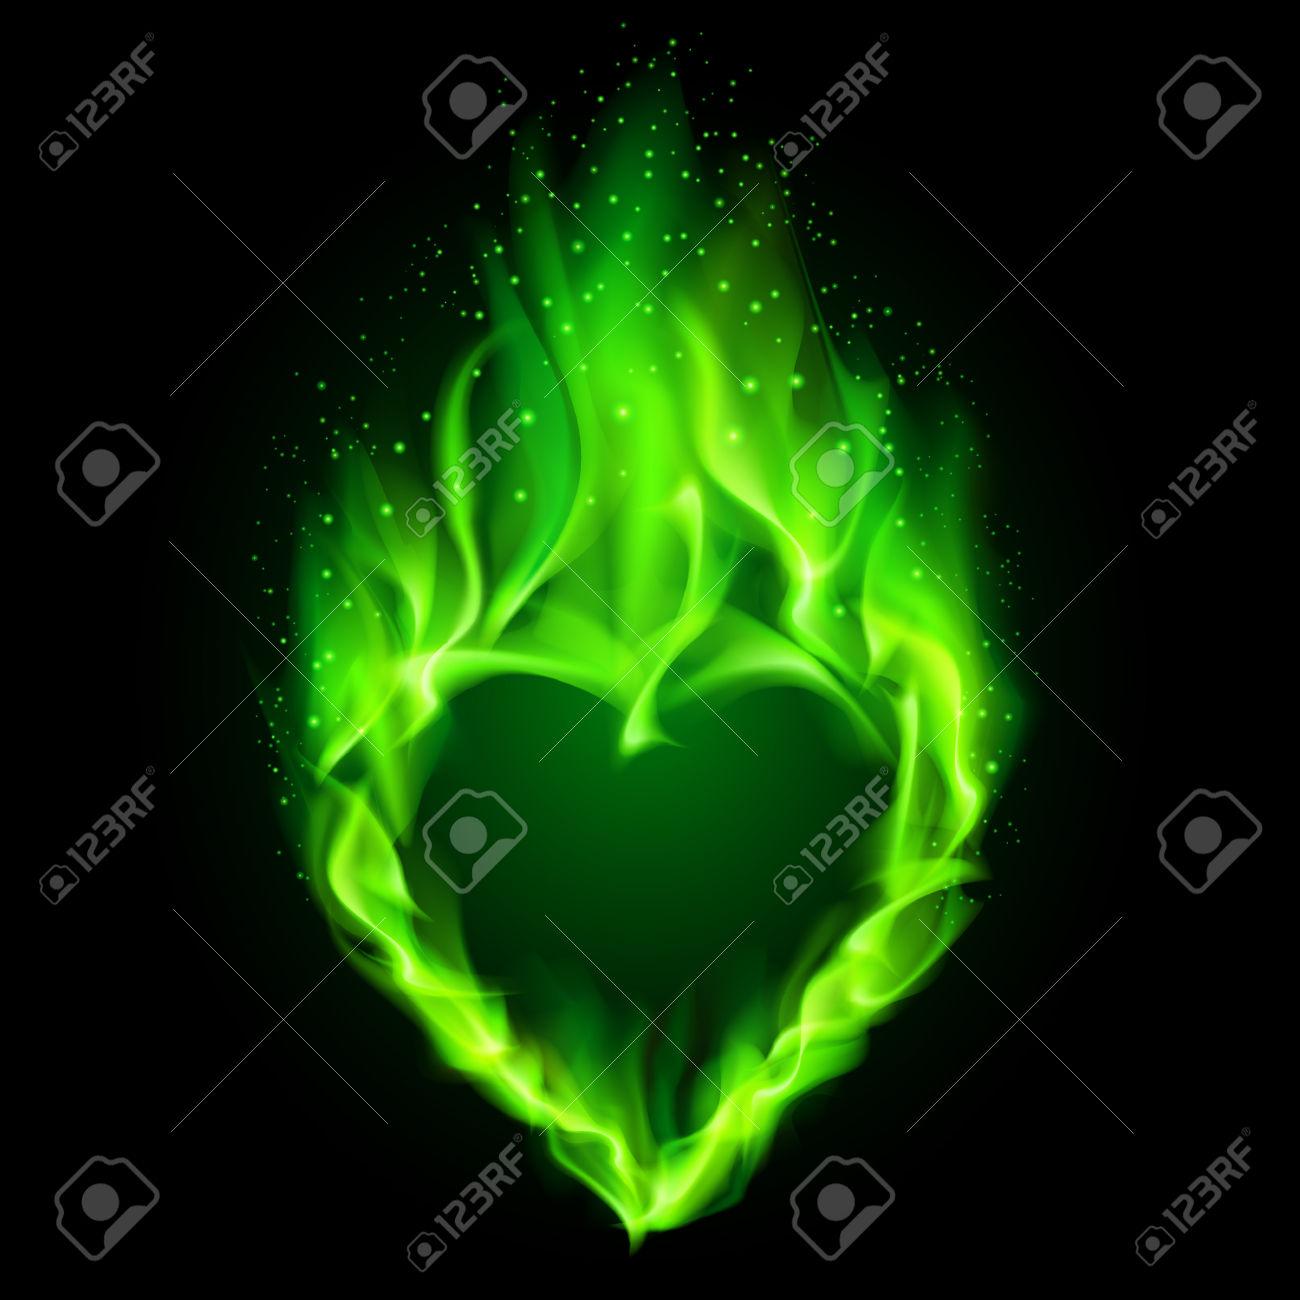 Flaming green hearts clipart jpg royalty free download Flaming green hearts clipart - ClipartFest jpg royalty free download